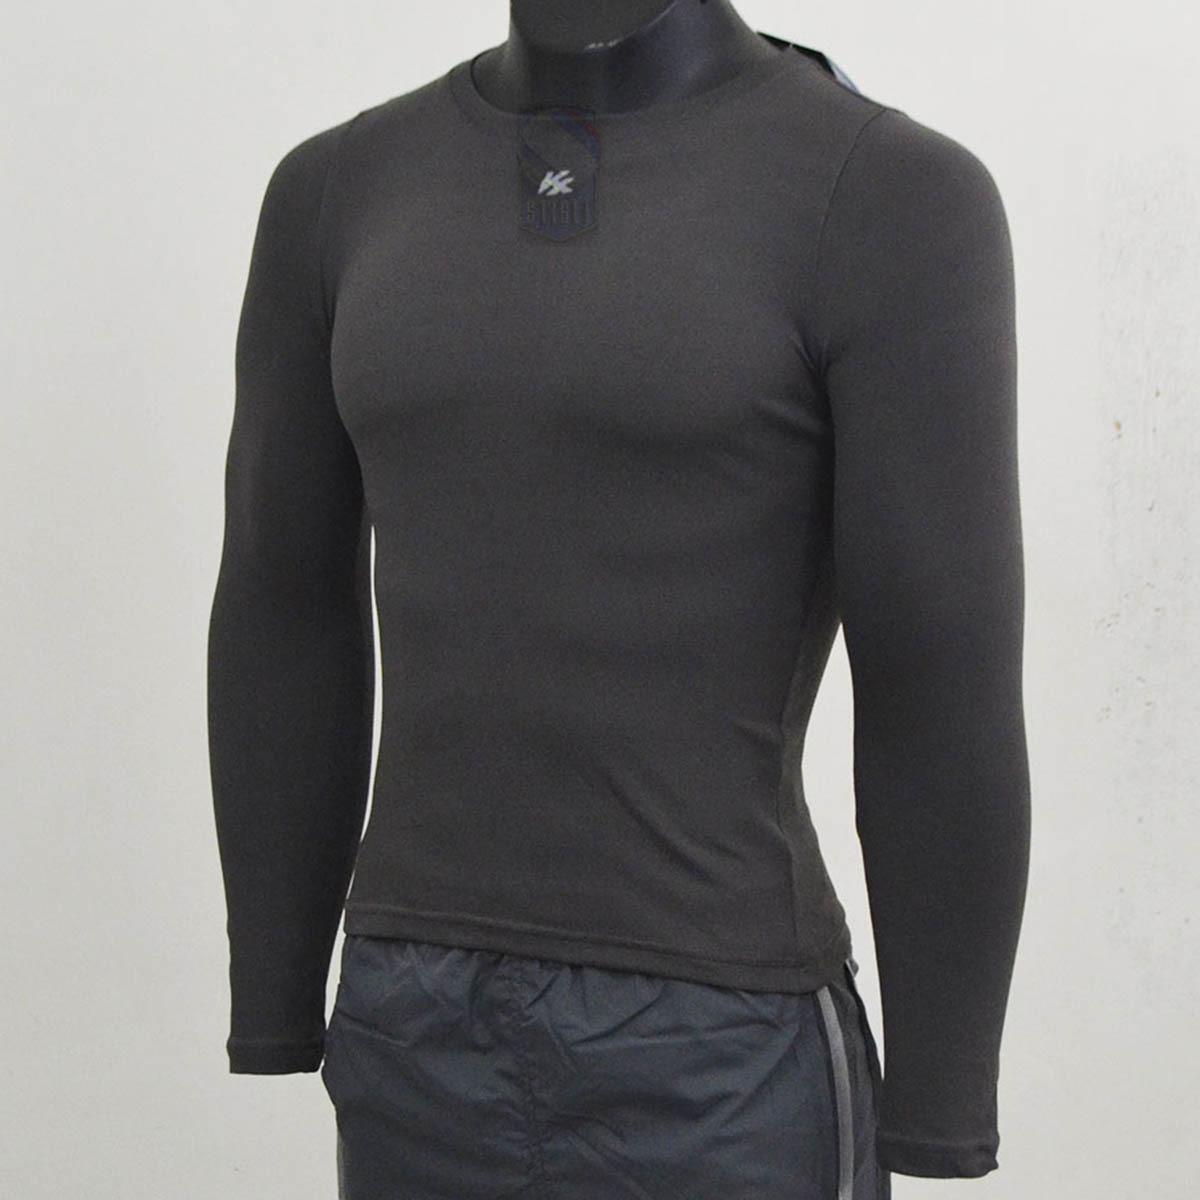 Camisa Térmica Kanxa Segunda Pele Manga Longa C nf Poliamida - R  99 ... 5ec7be4b8c10a